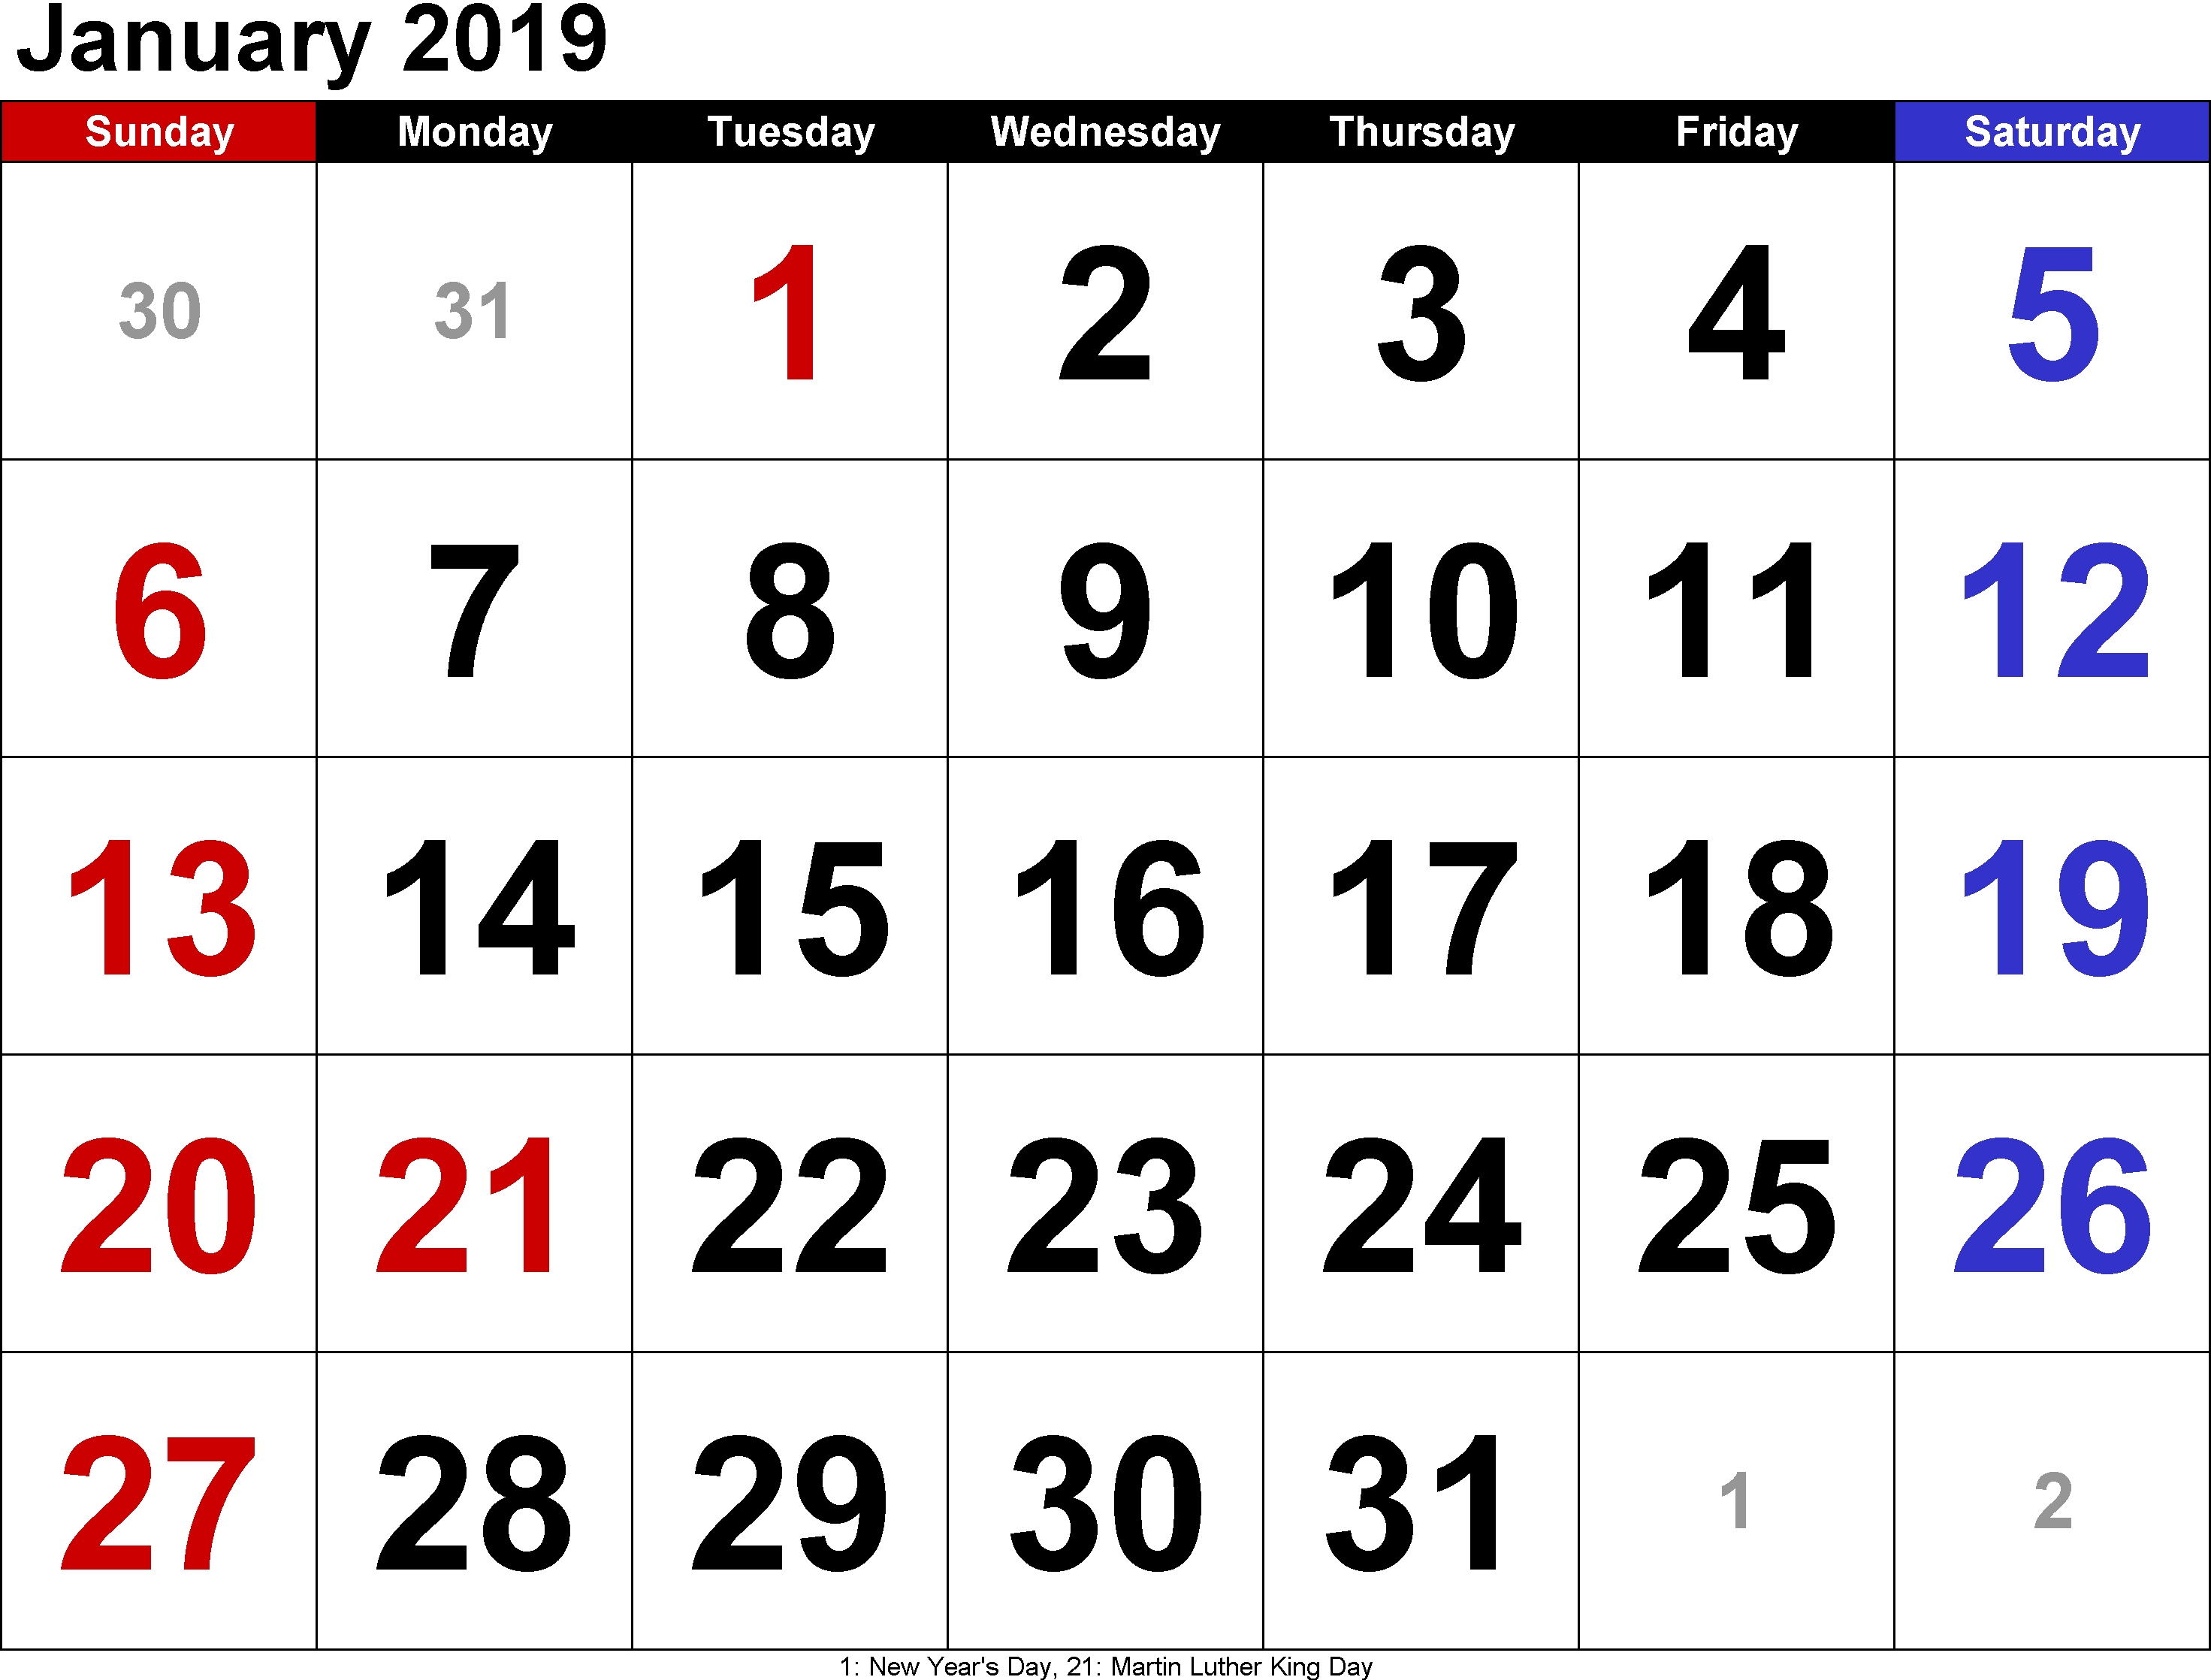 Free January Calendar 2019   January 2019 Calendar   Pinterest January 7 2019 Calendar